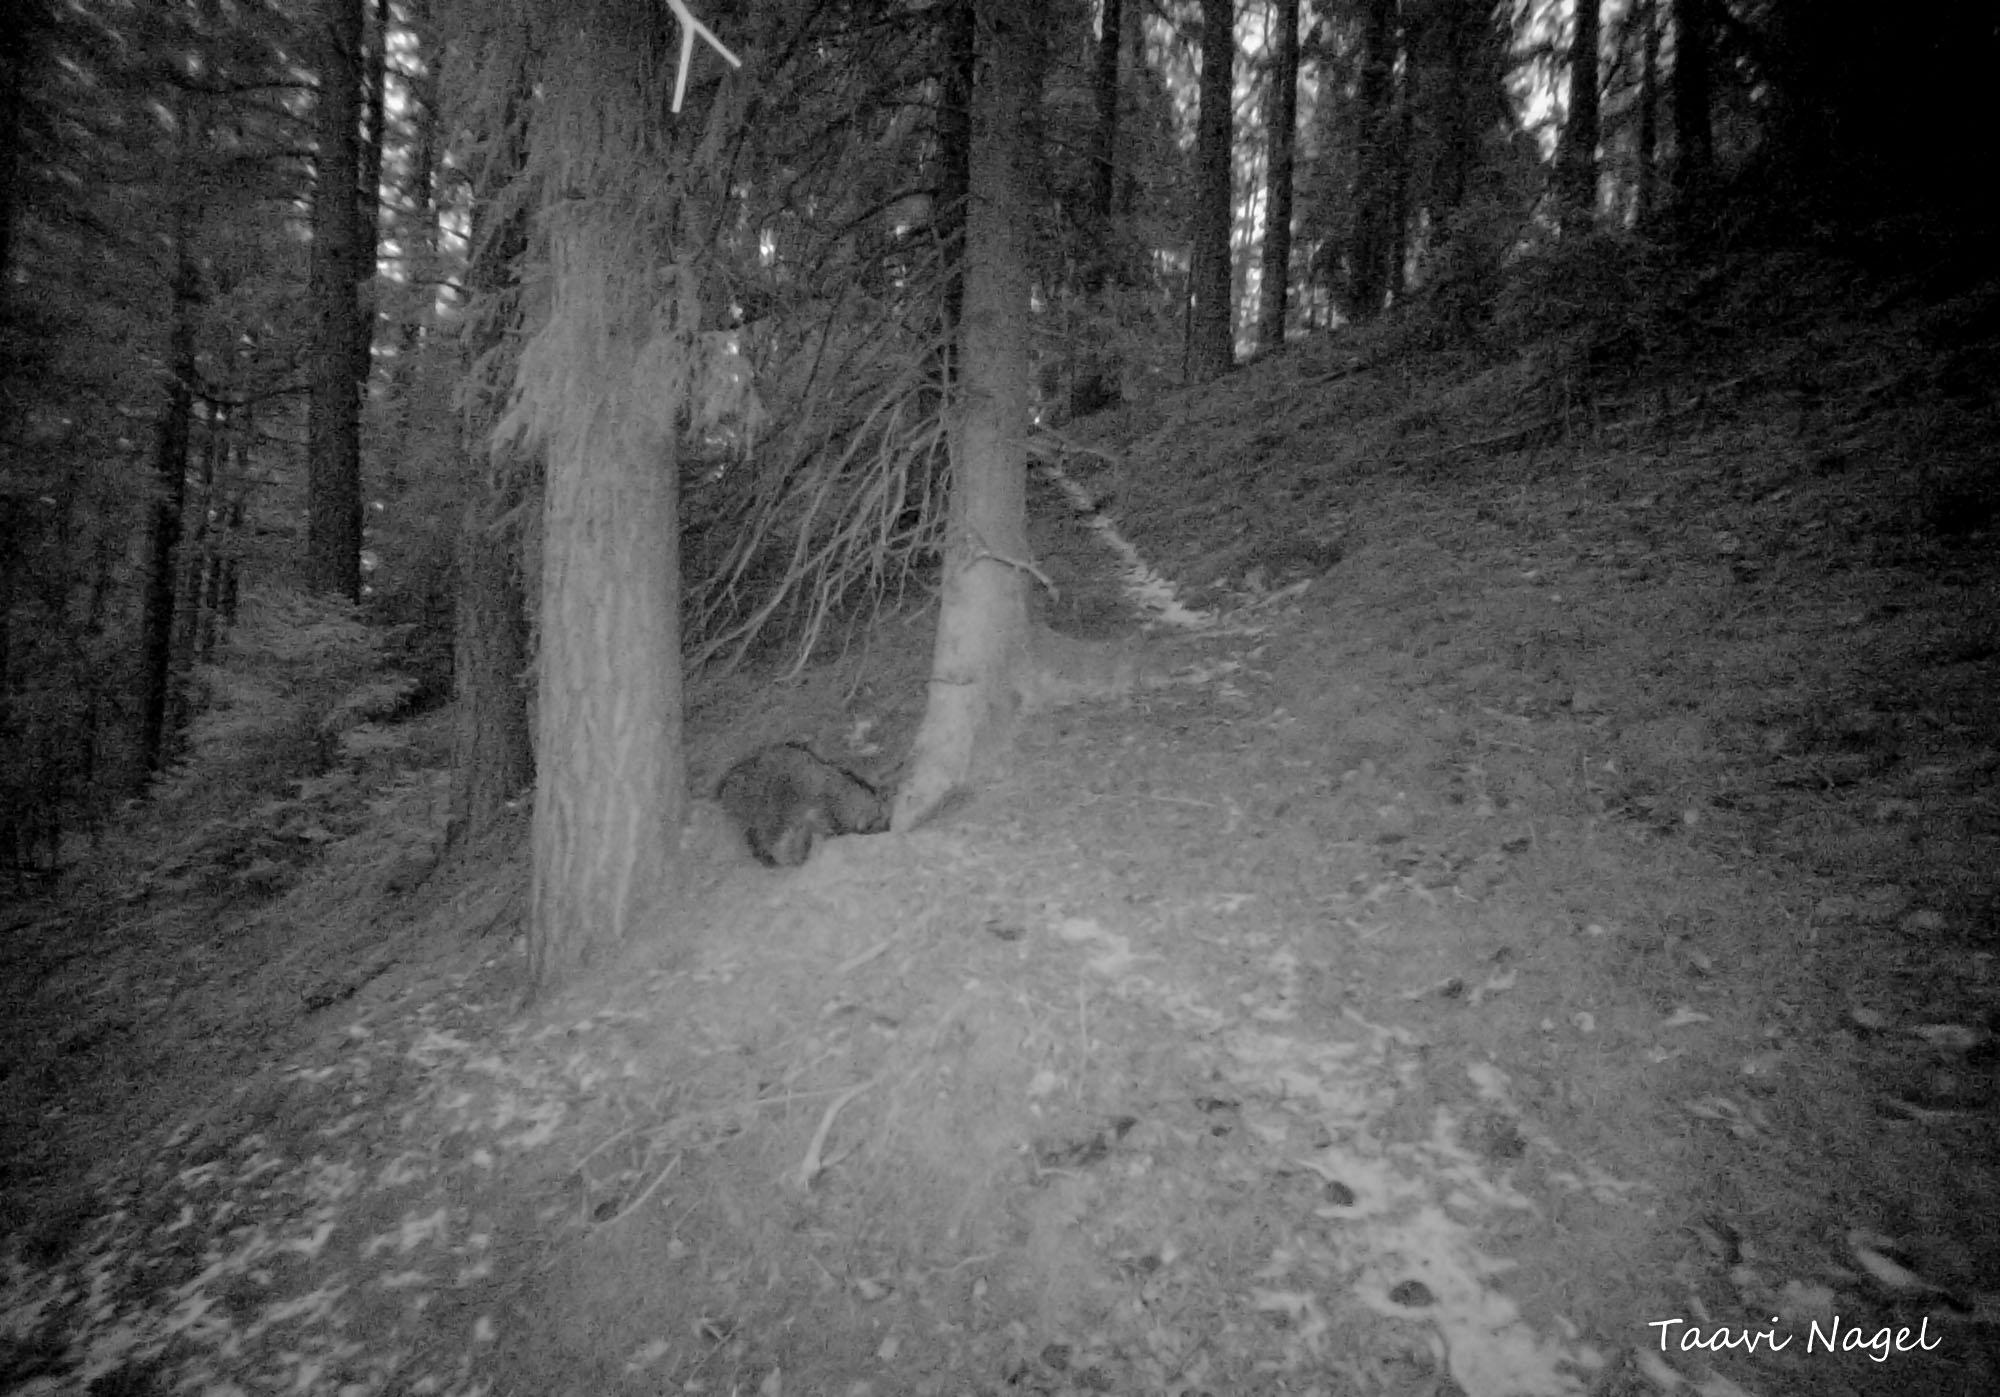 Pimedas metsas